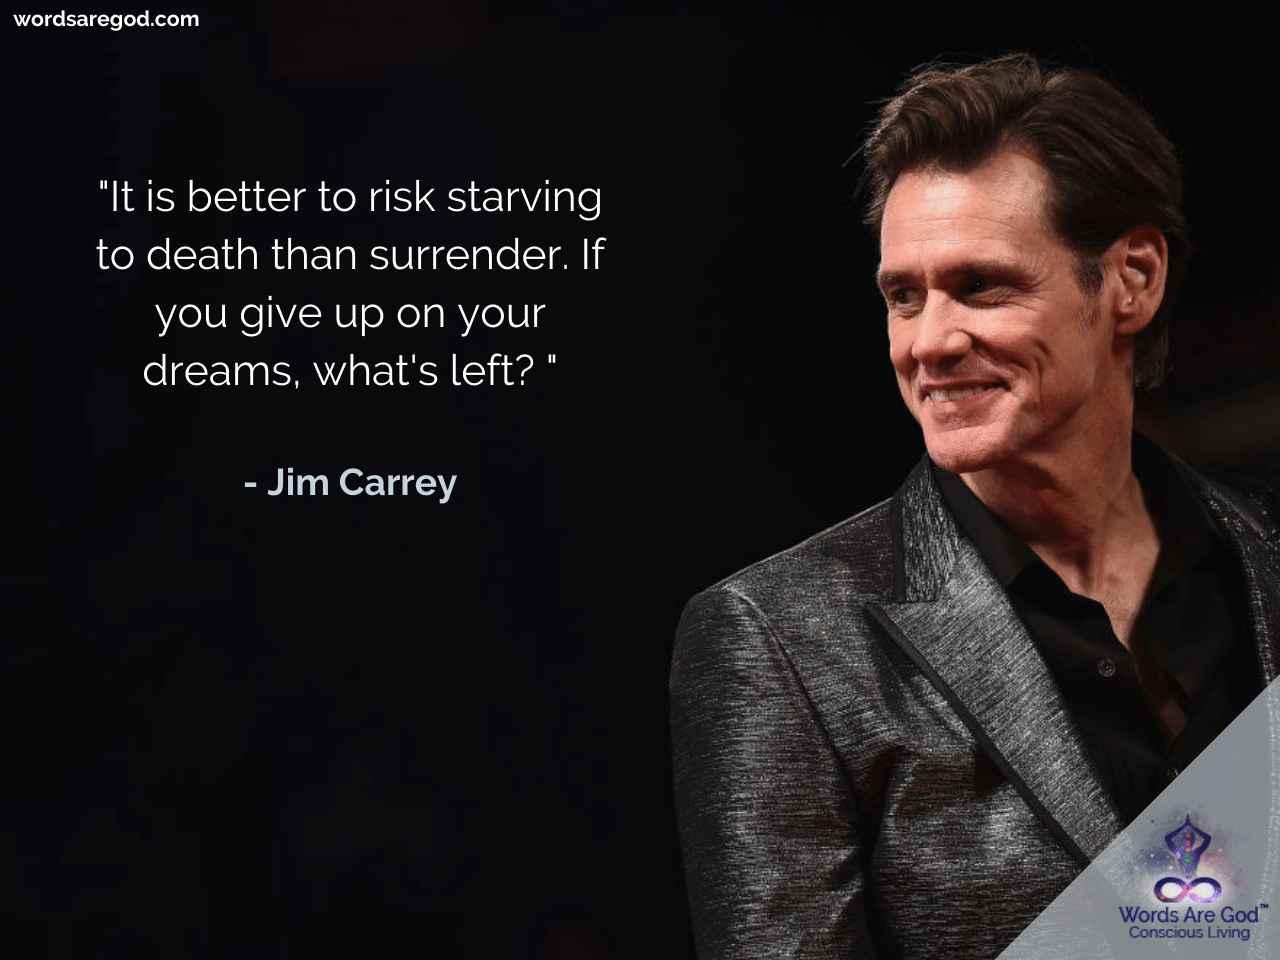 Jim Carrey Life Quotes by Jim Carrey